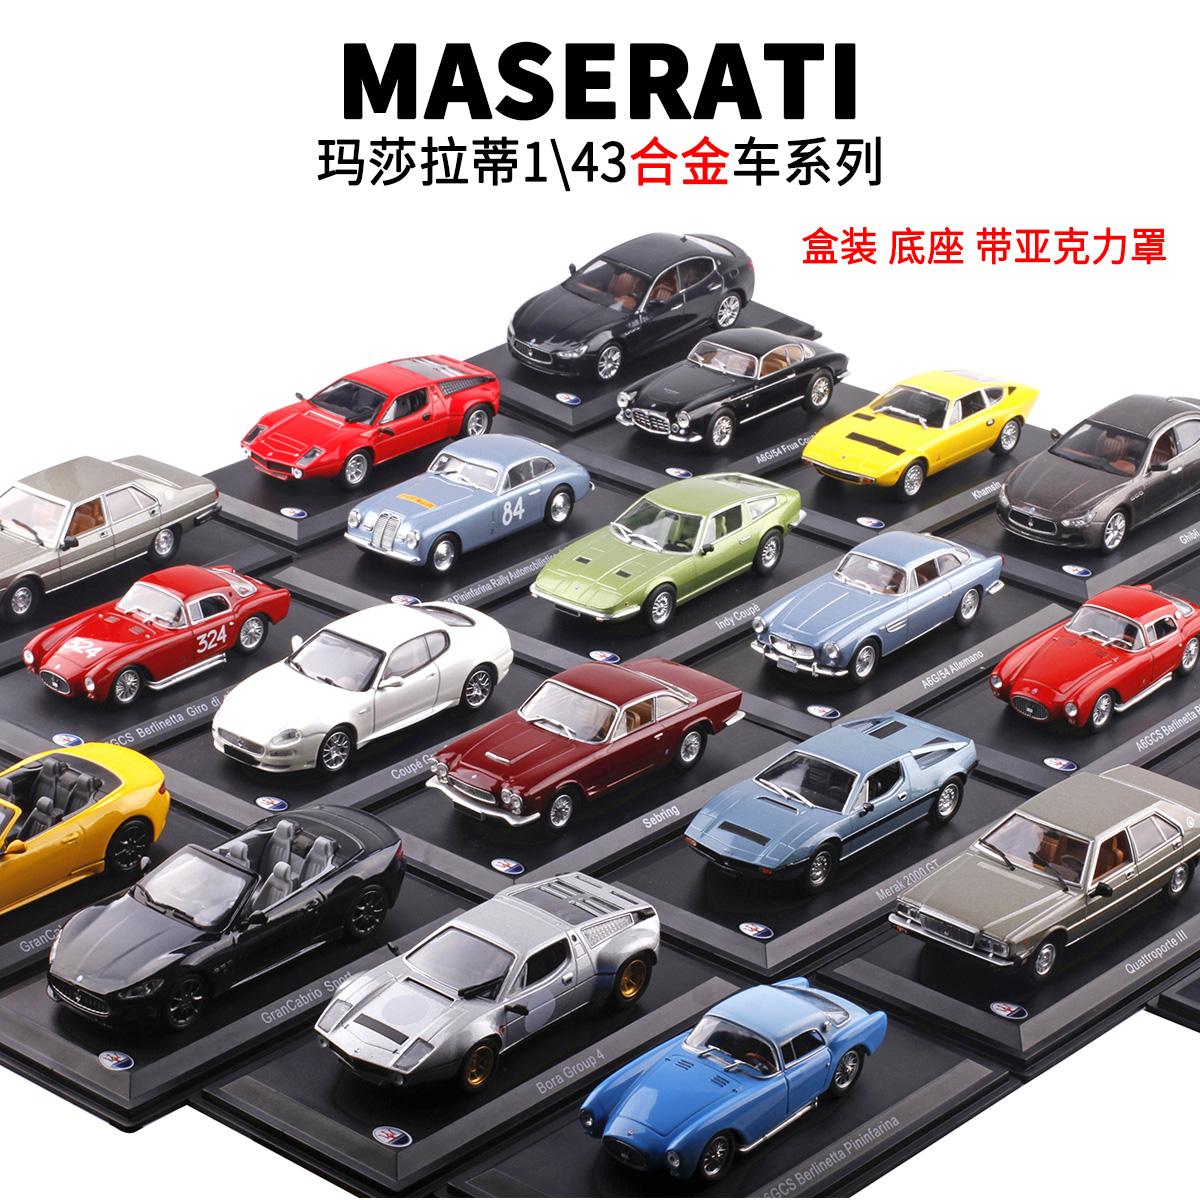 LEO原厂1:43玛莎拉蒂全系合金汽车模型 总裁经典复古肌肉跑车收藏